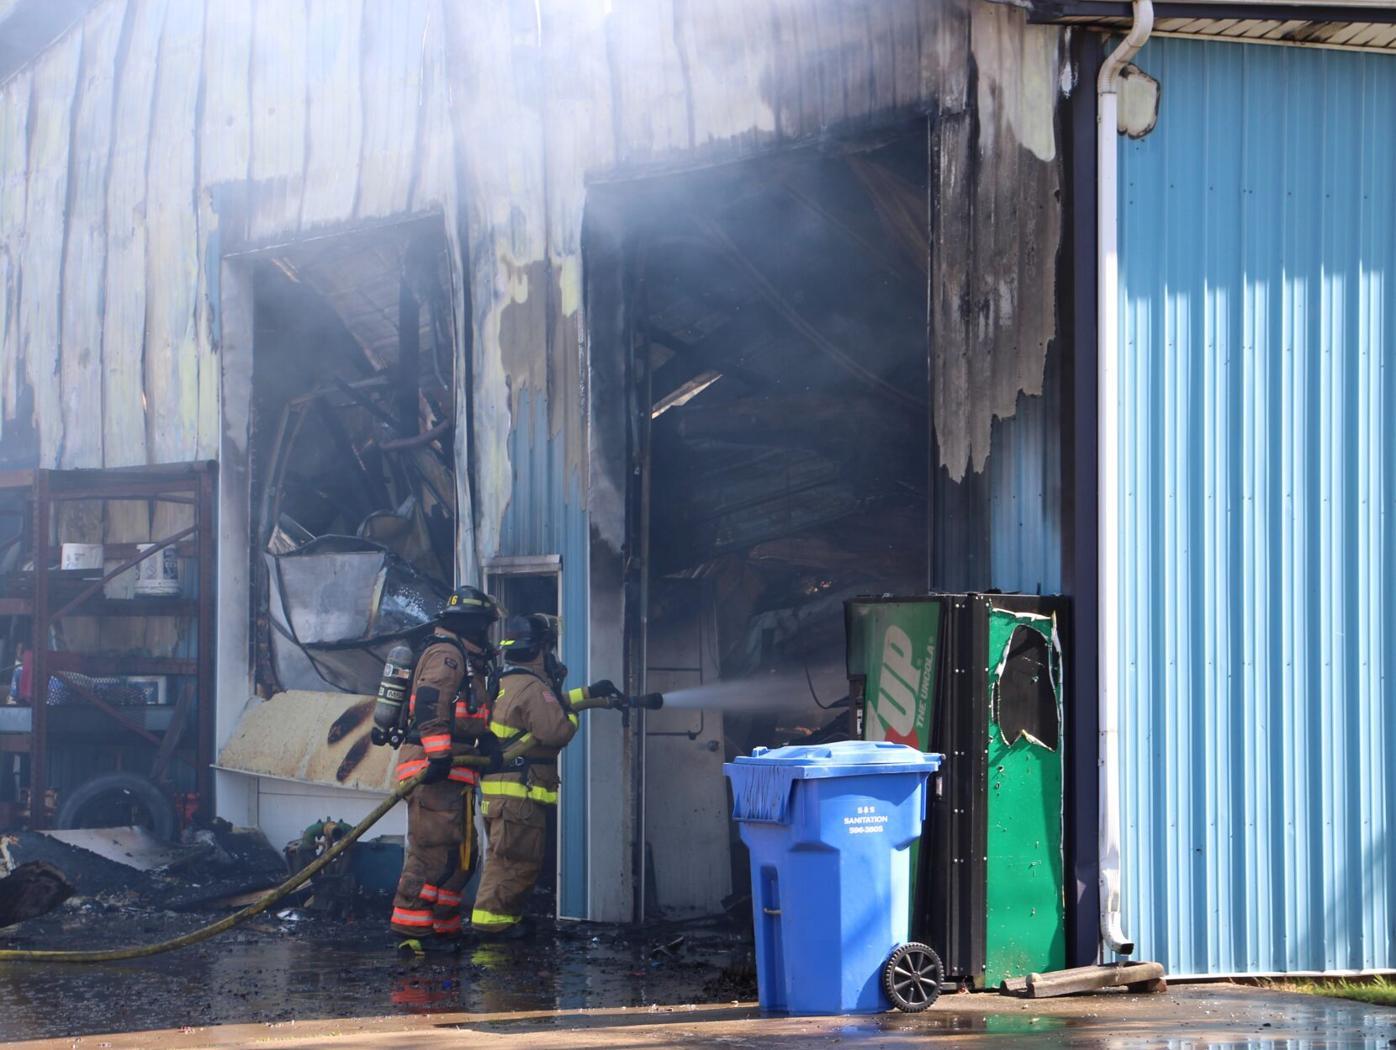 Ohio 66 South fire